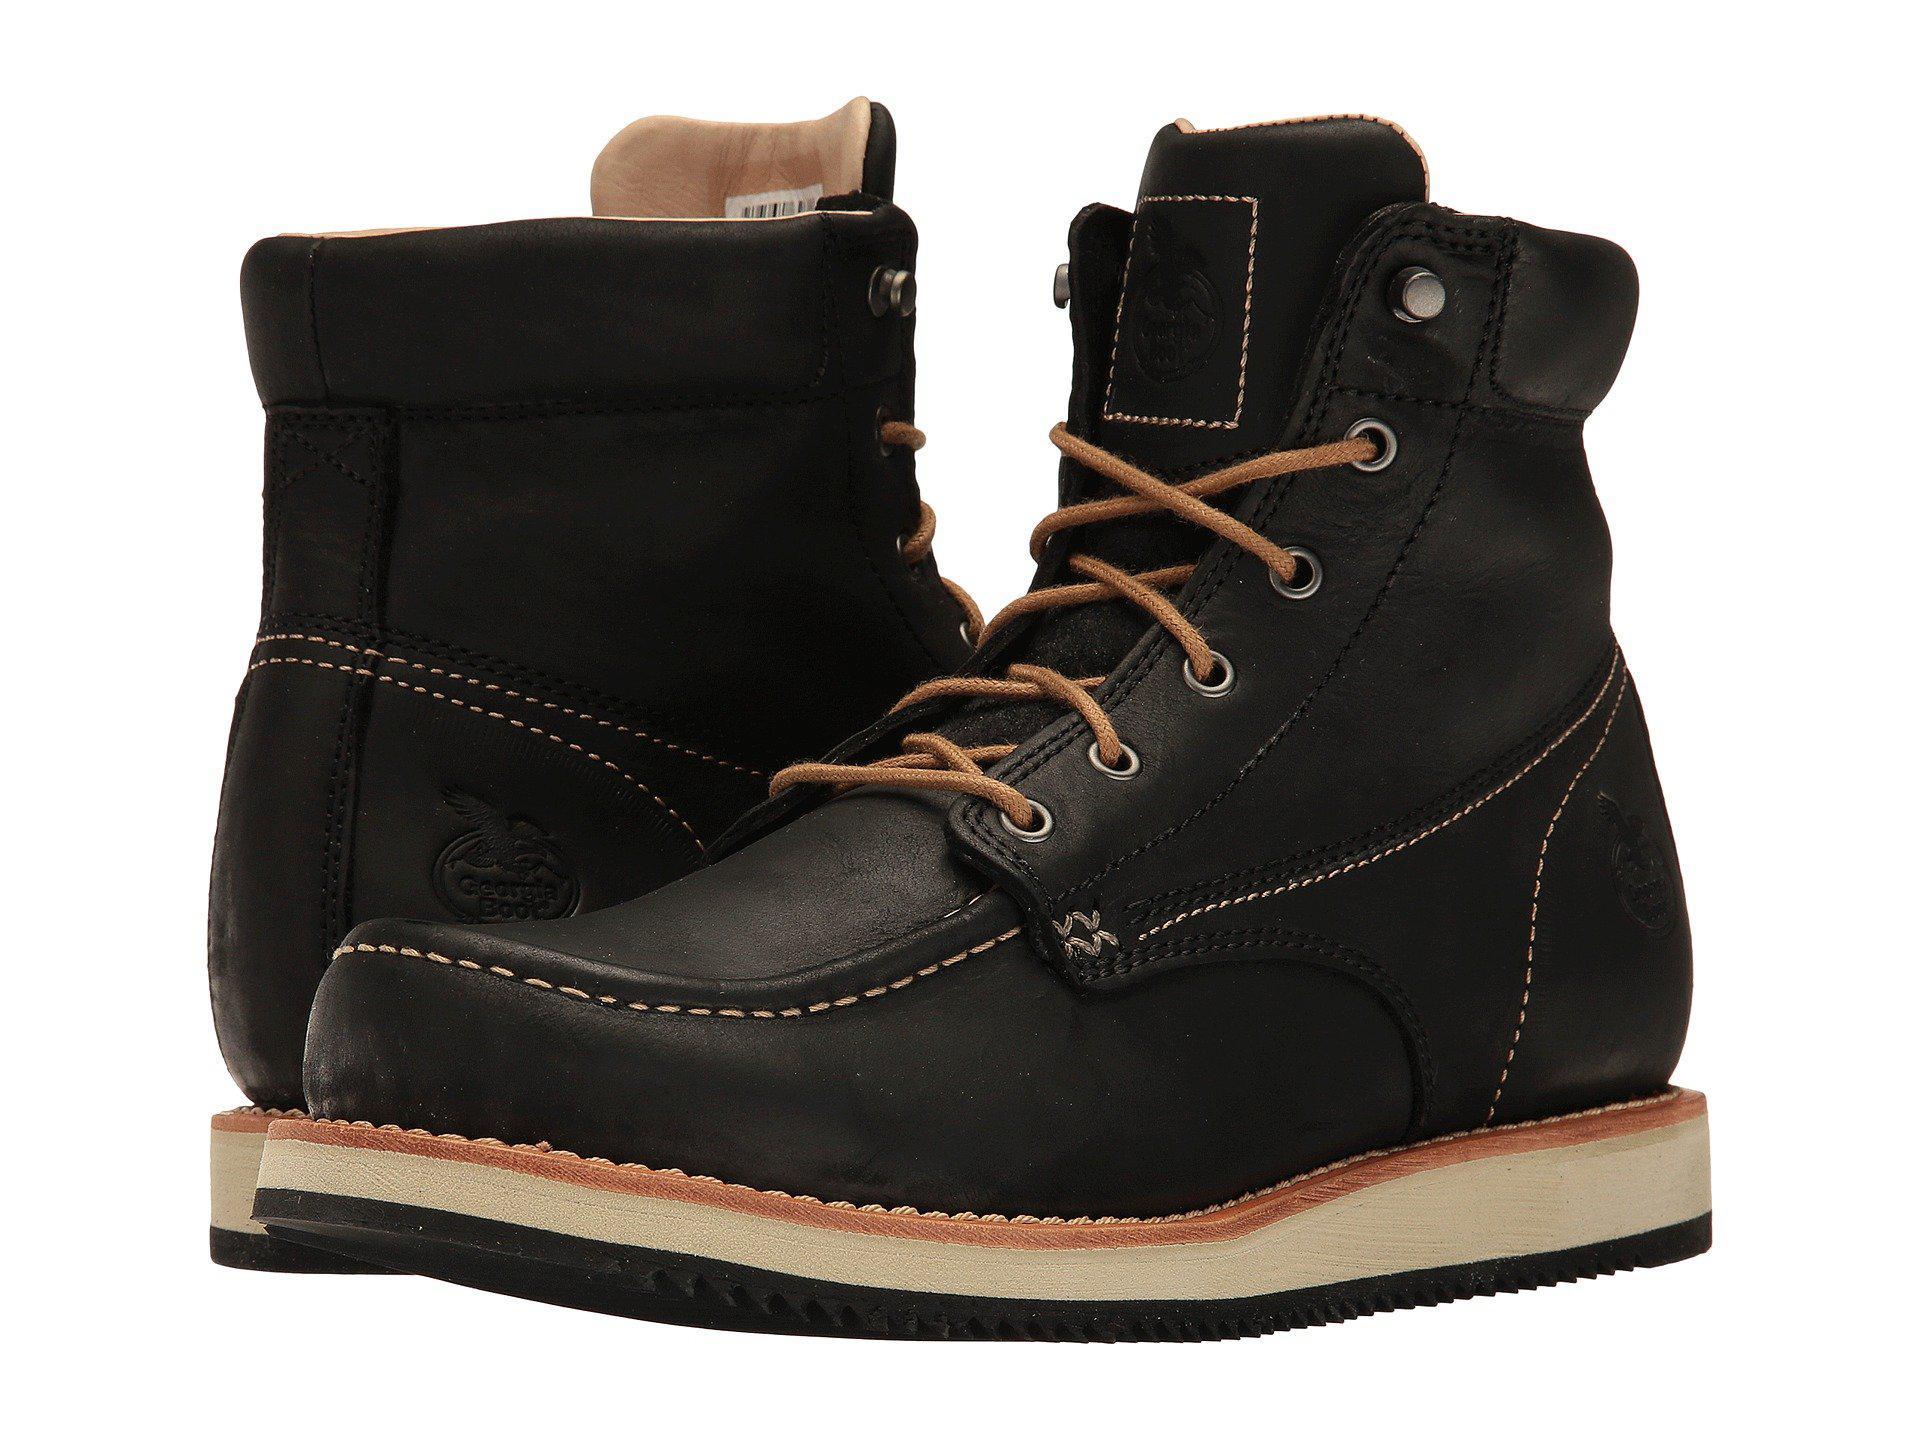 cd6602850cd Lyst - Georgia Boot Small Batch 6 Moc Toe Wedge (black) Men s Work ...